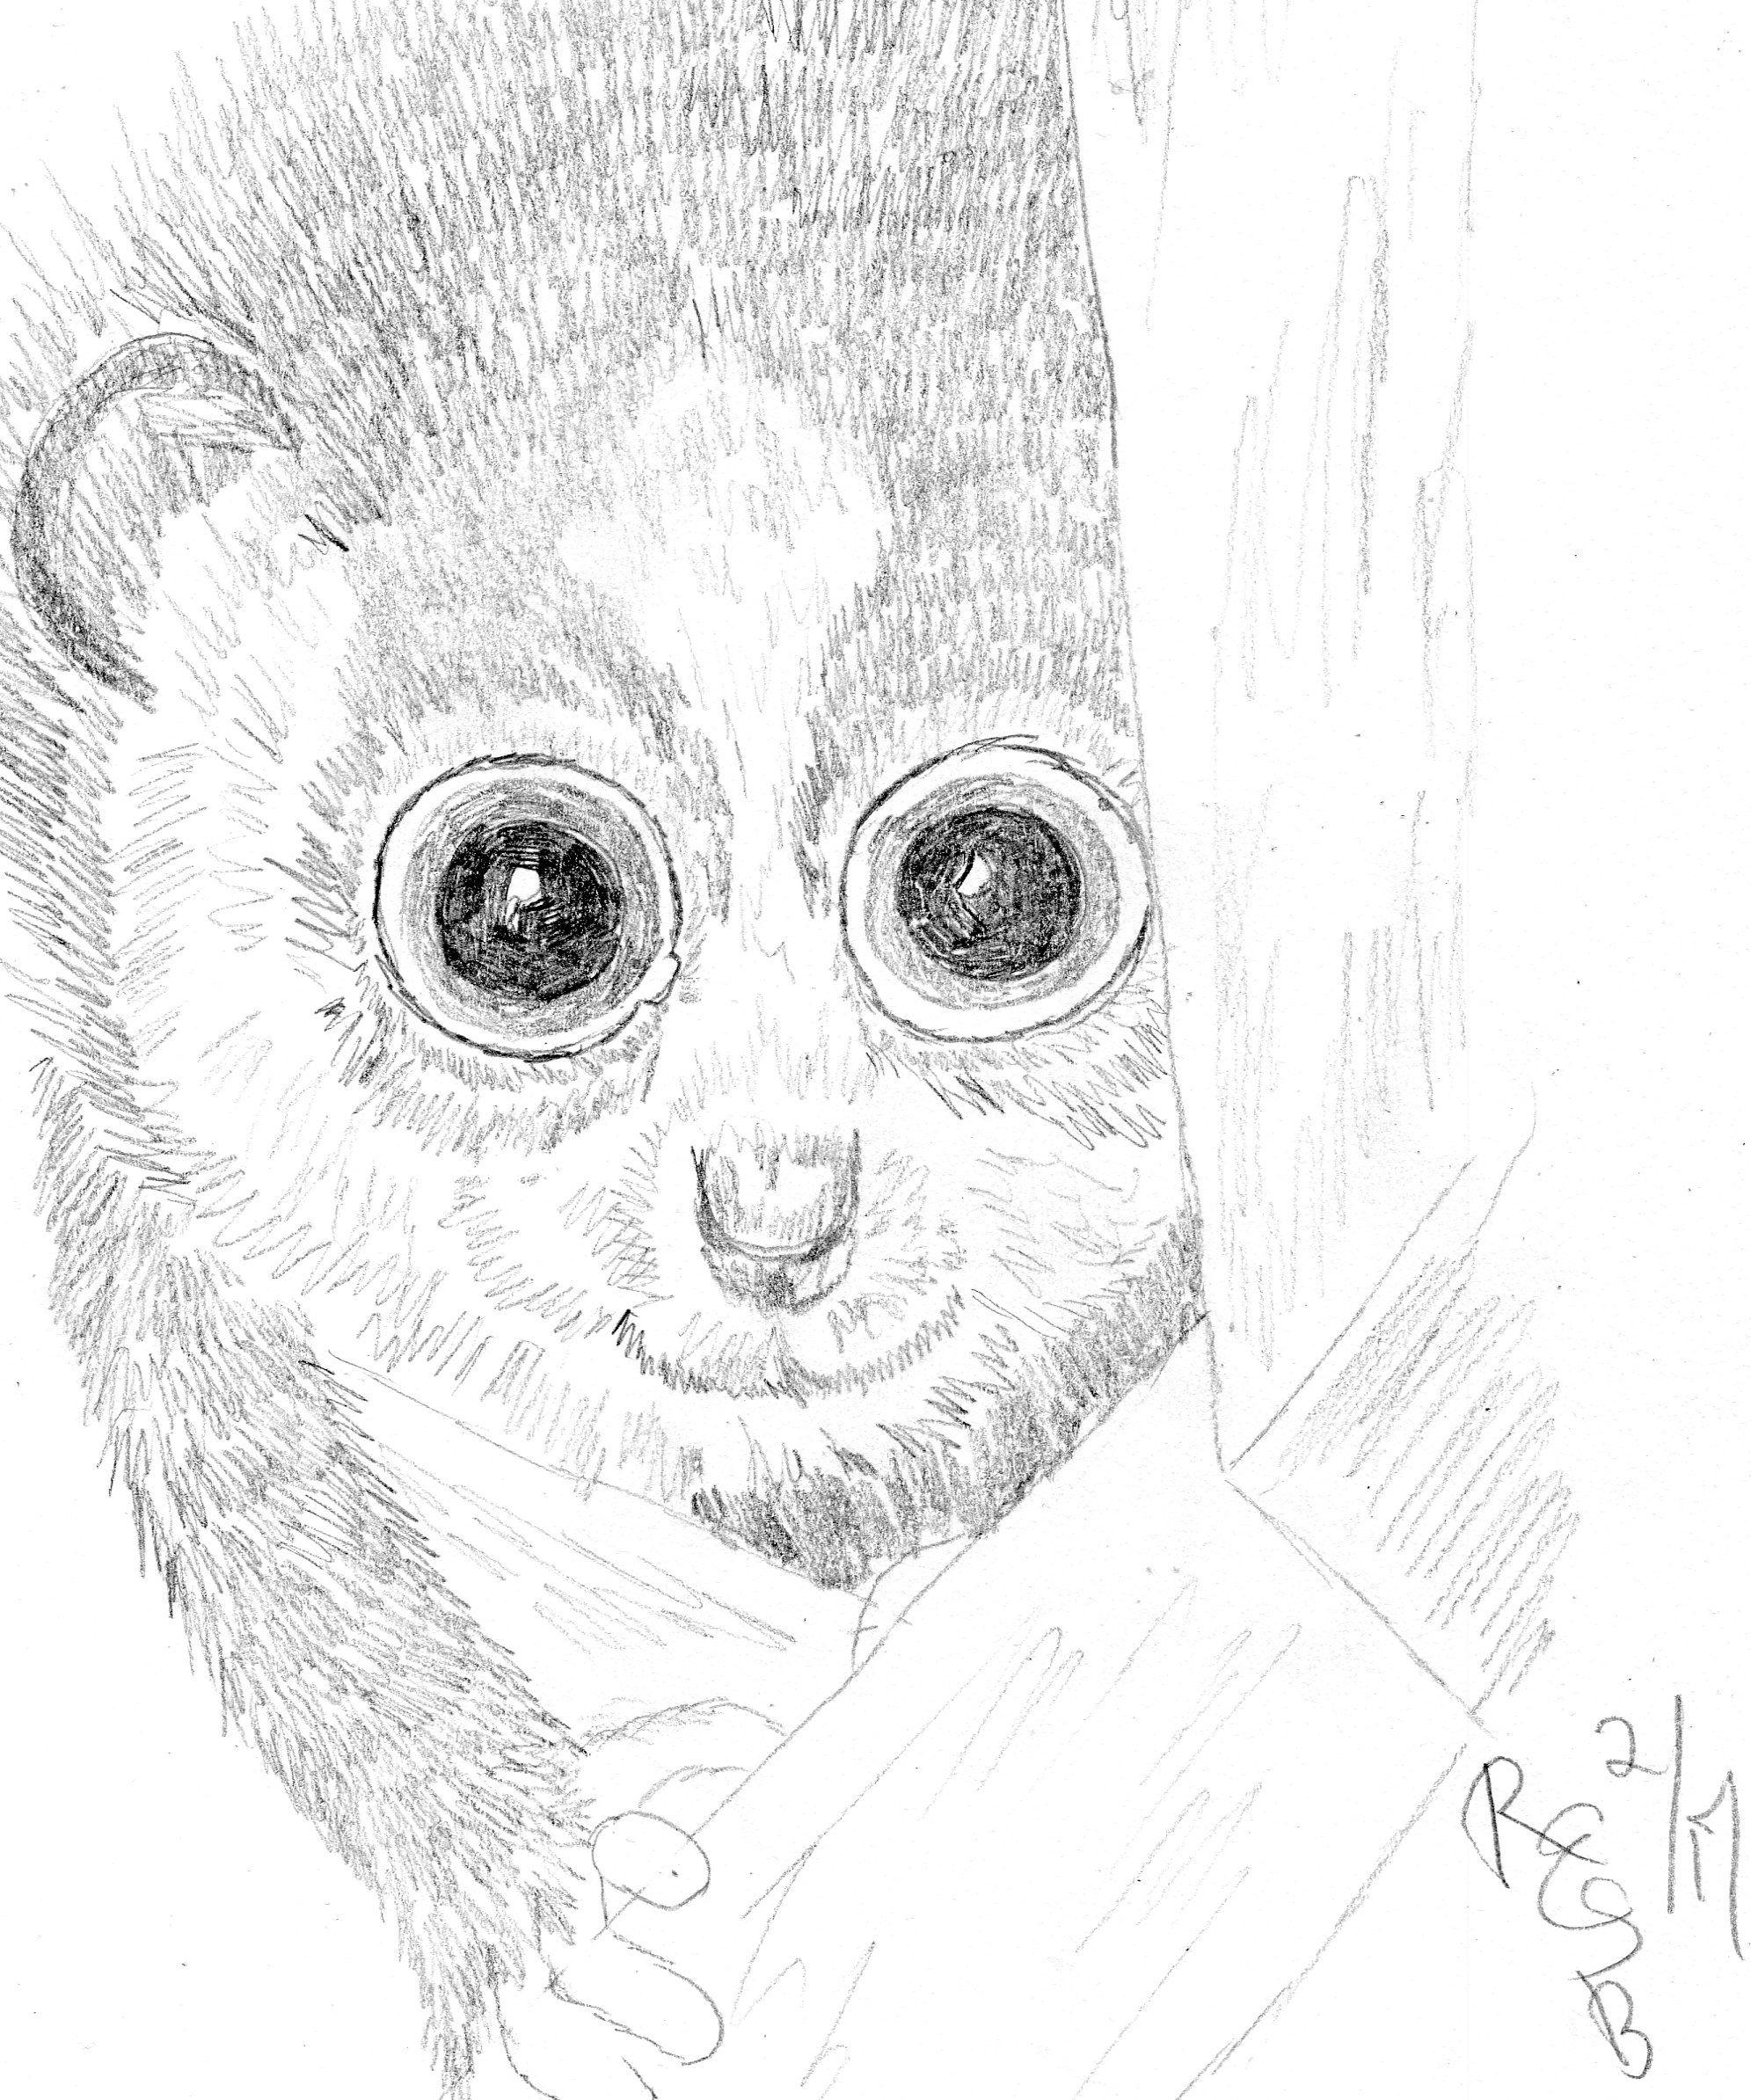 Loras monkey